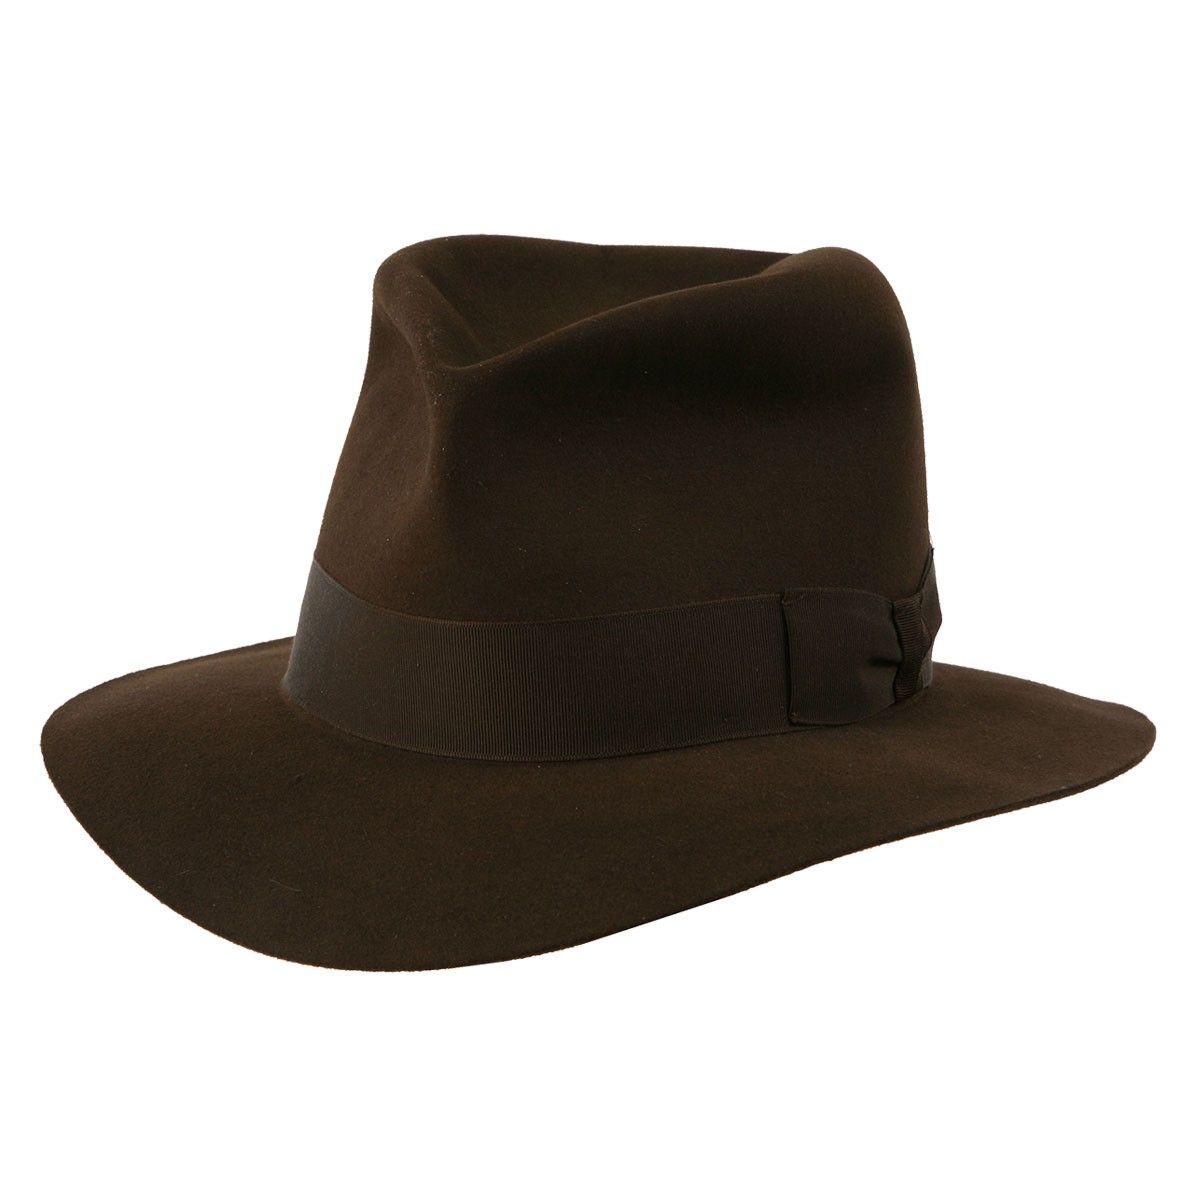 4f61cf3d2 Herbert Johnson - Poet Hat 250 Years of British Craftsmanship. The ...